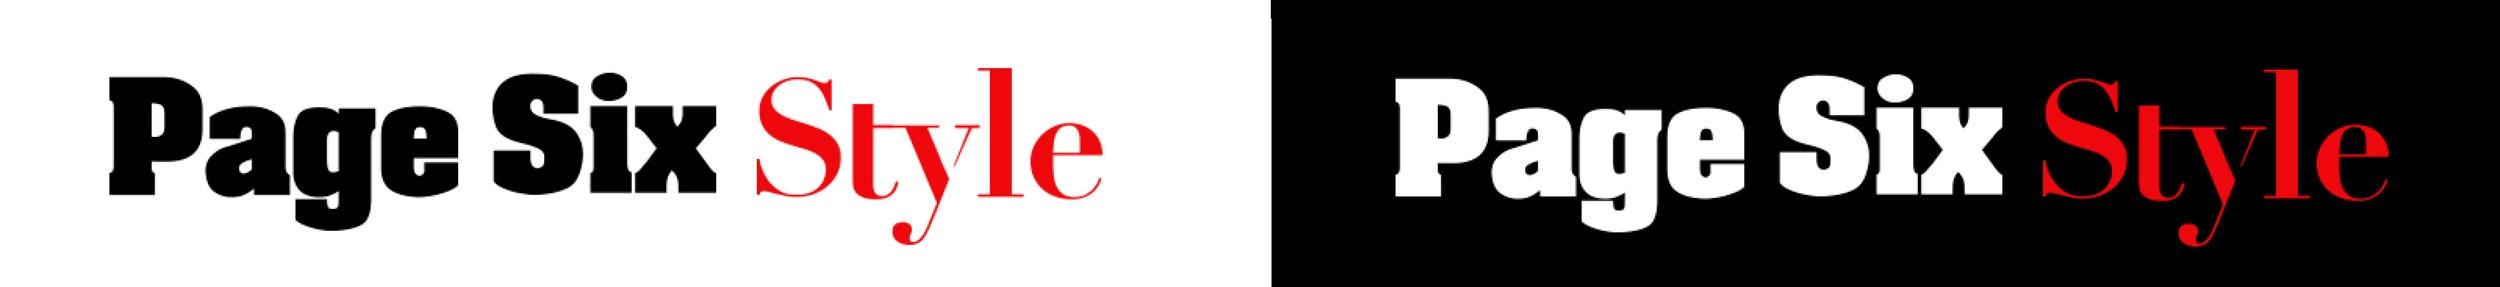 P6_Style_Logos_horizontal.jpg